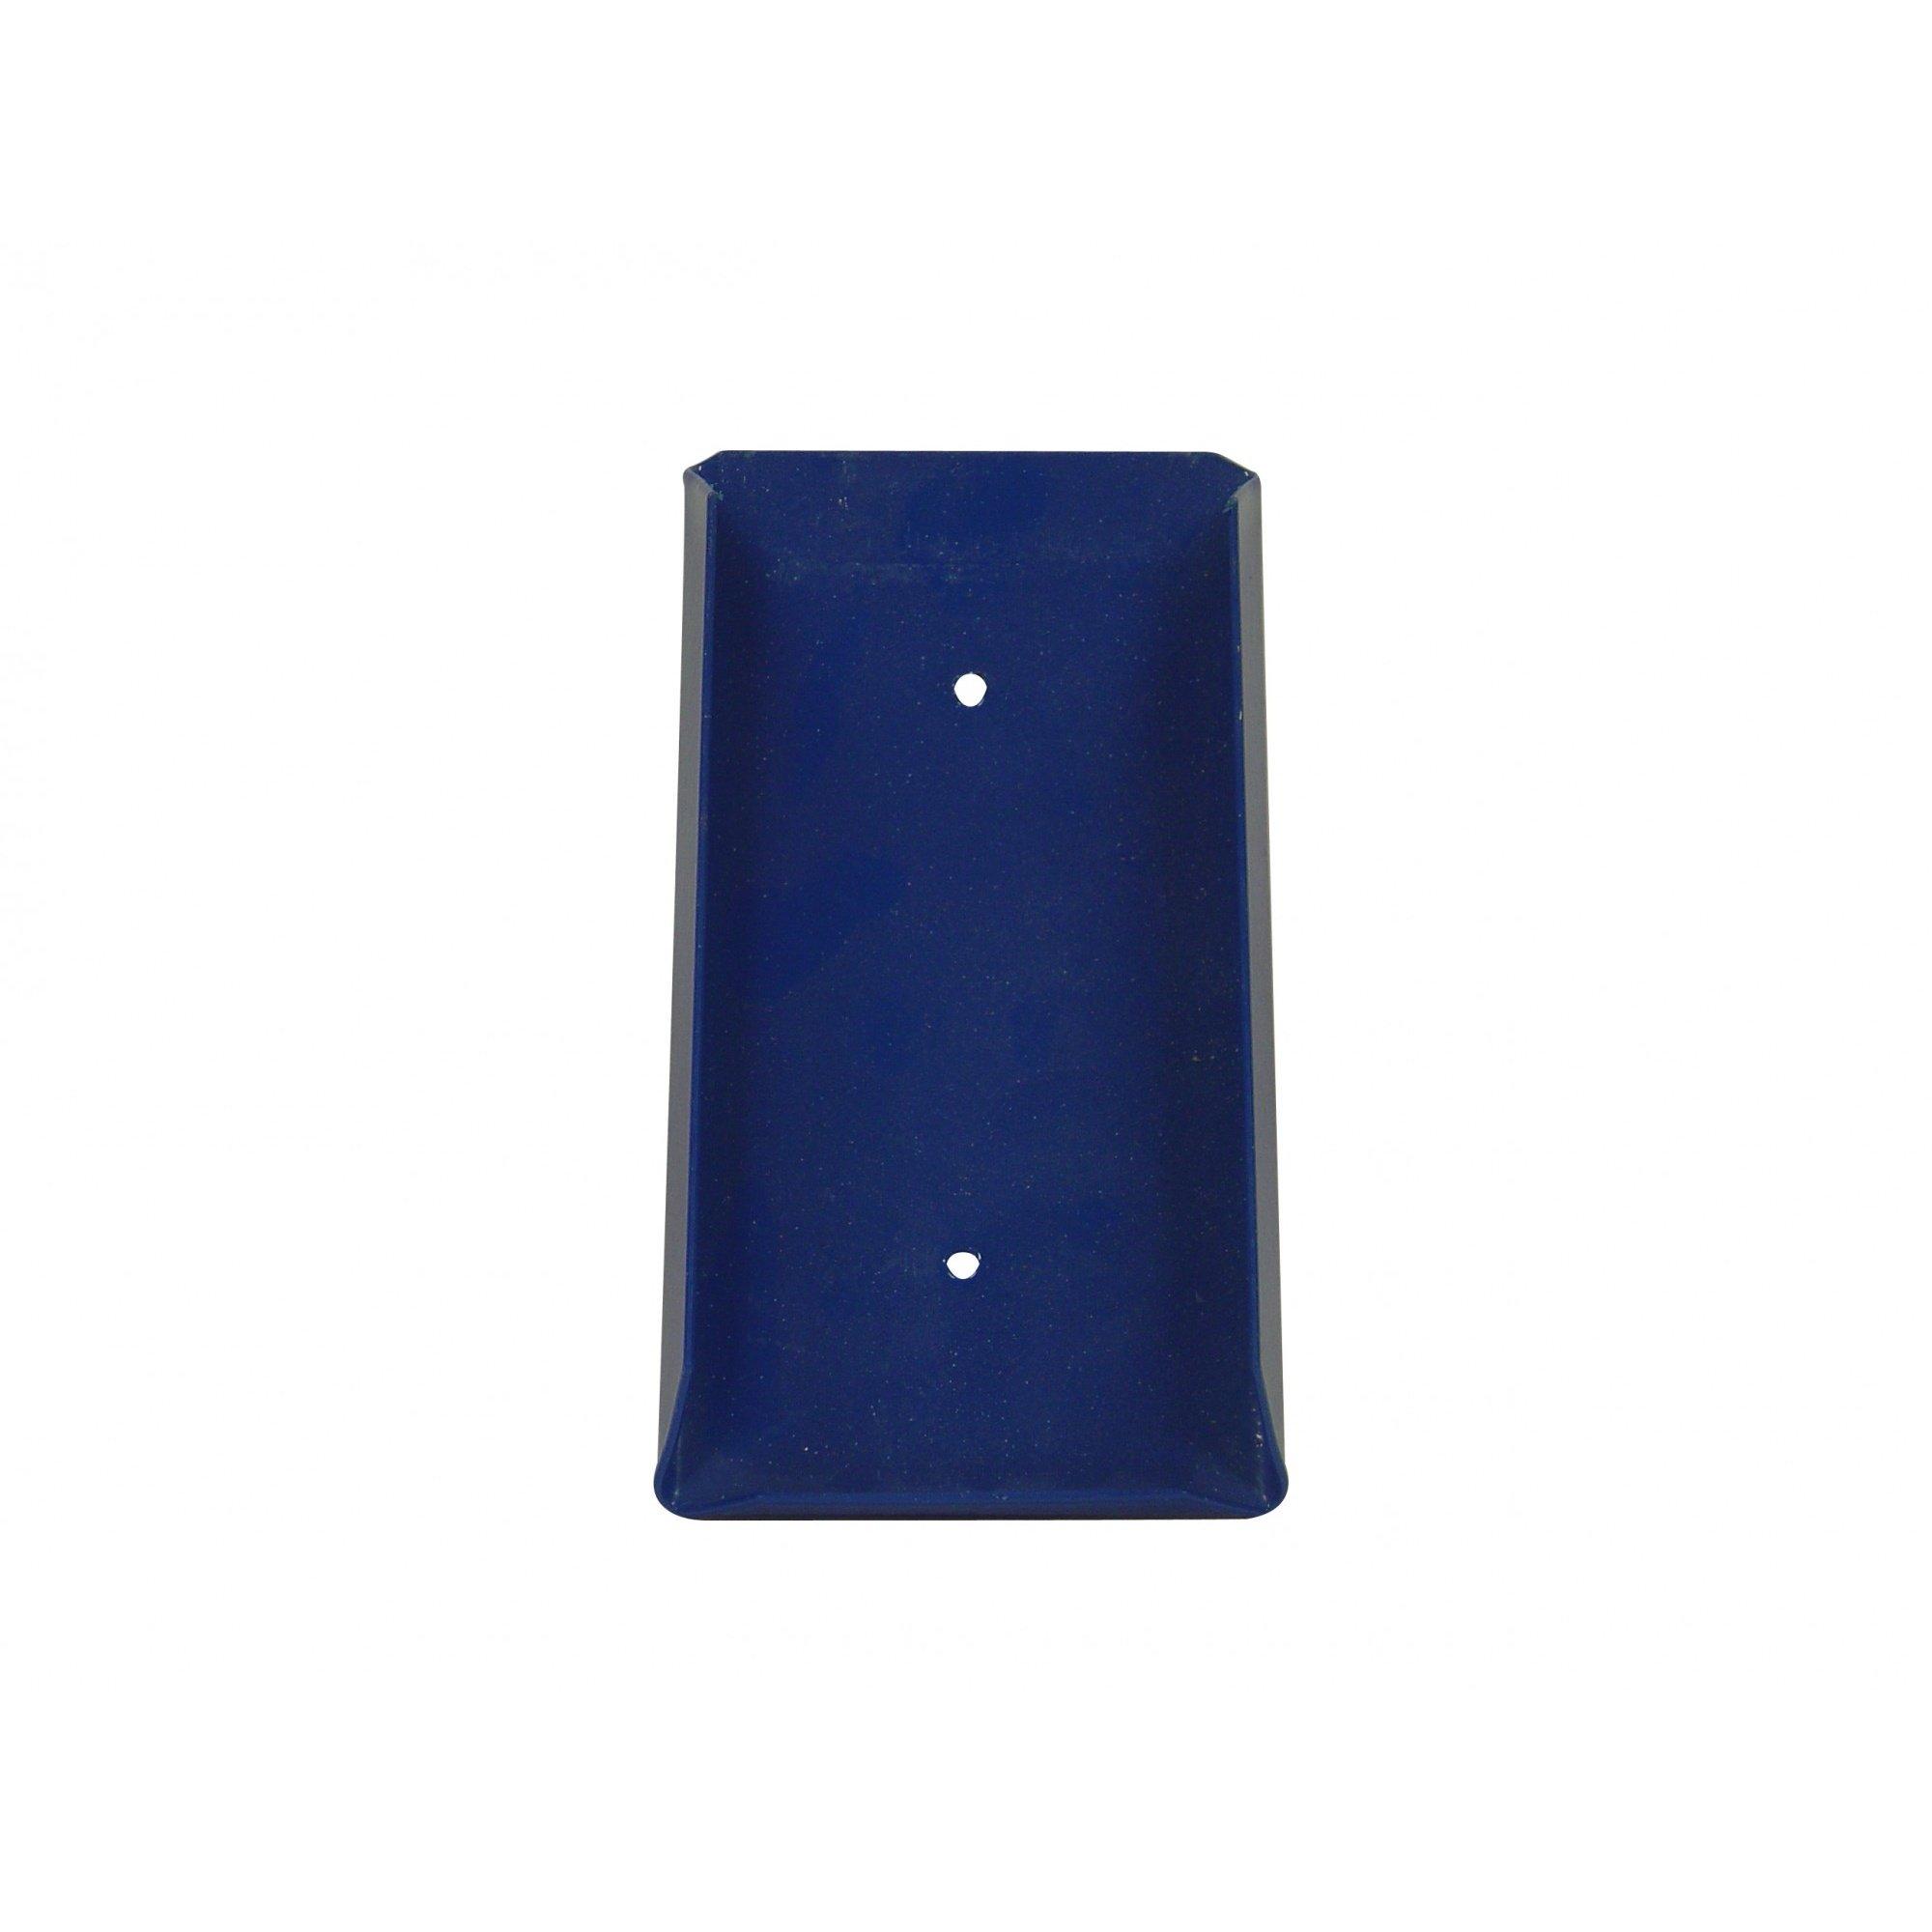 Stubbs Salt Lick Holder Economy S25PE (One Size) (Blue) by Stubbs